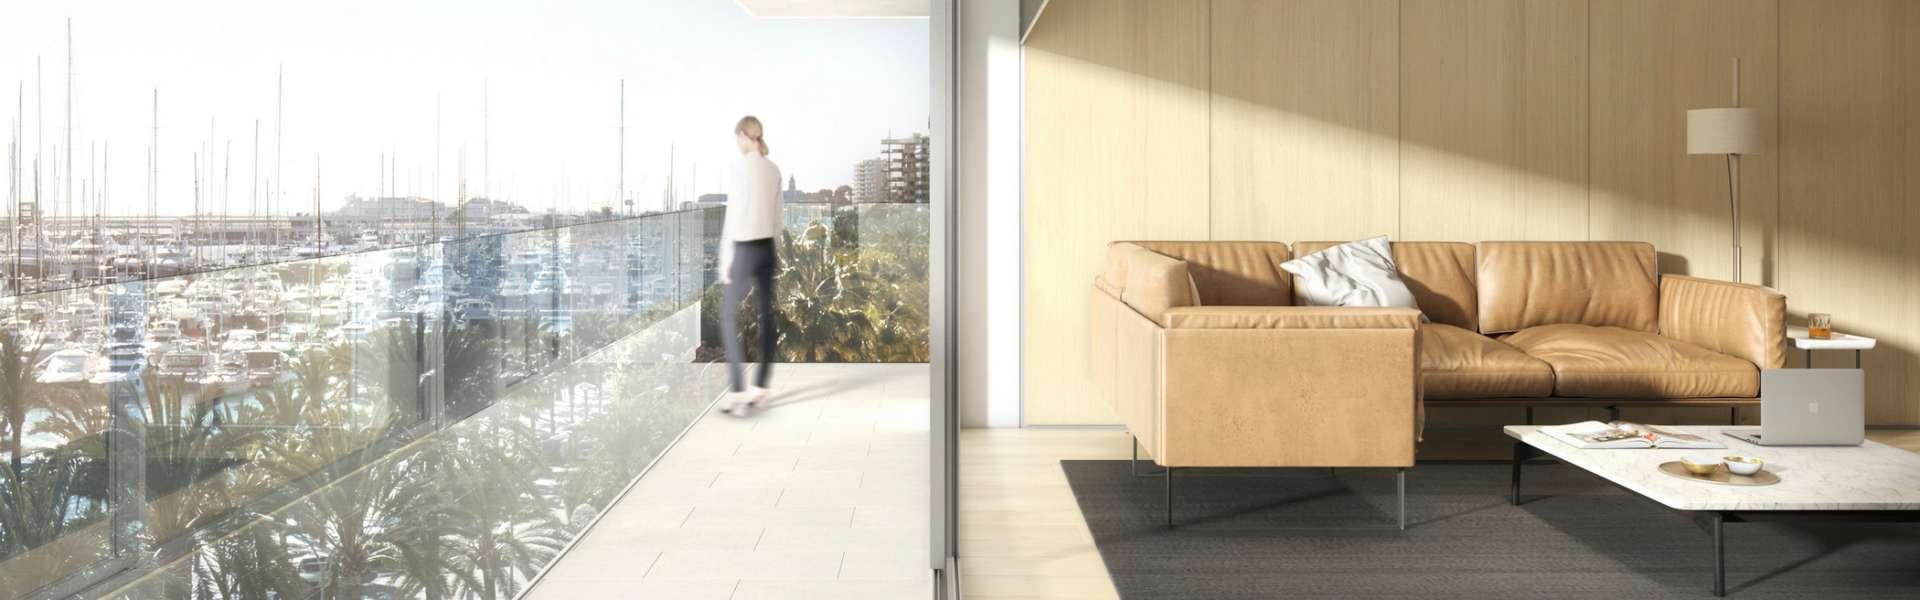 Palma - Luxuriöses Apartment mit modernem Design und spektakulärem Ausblick